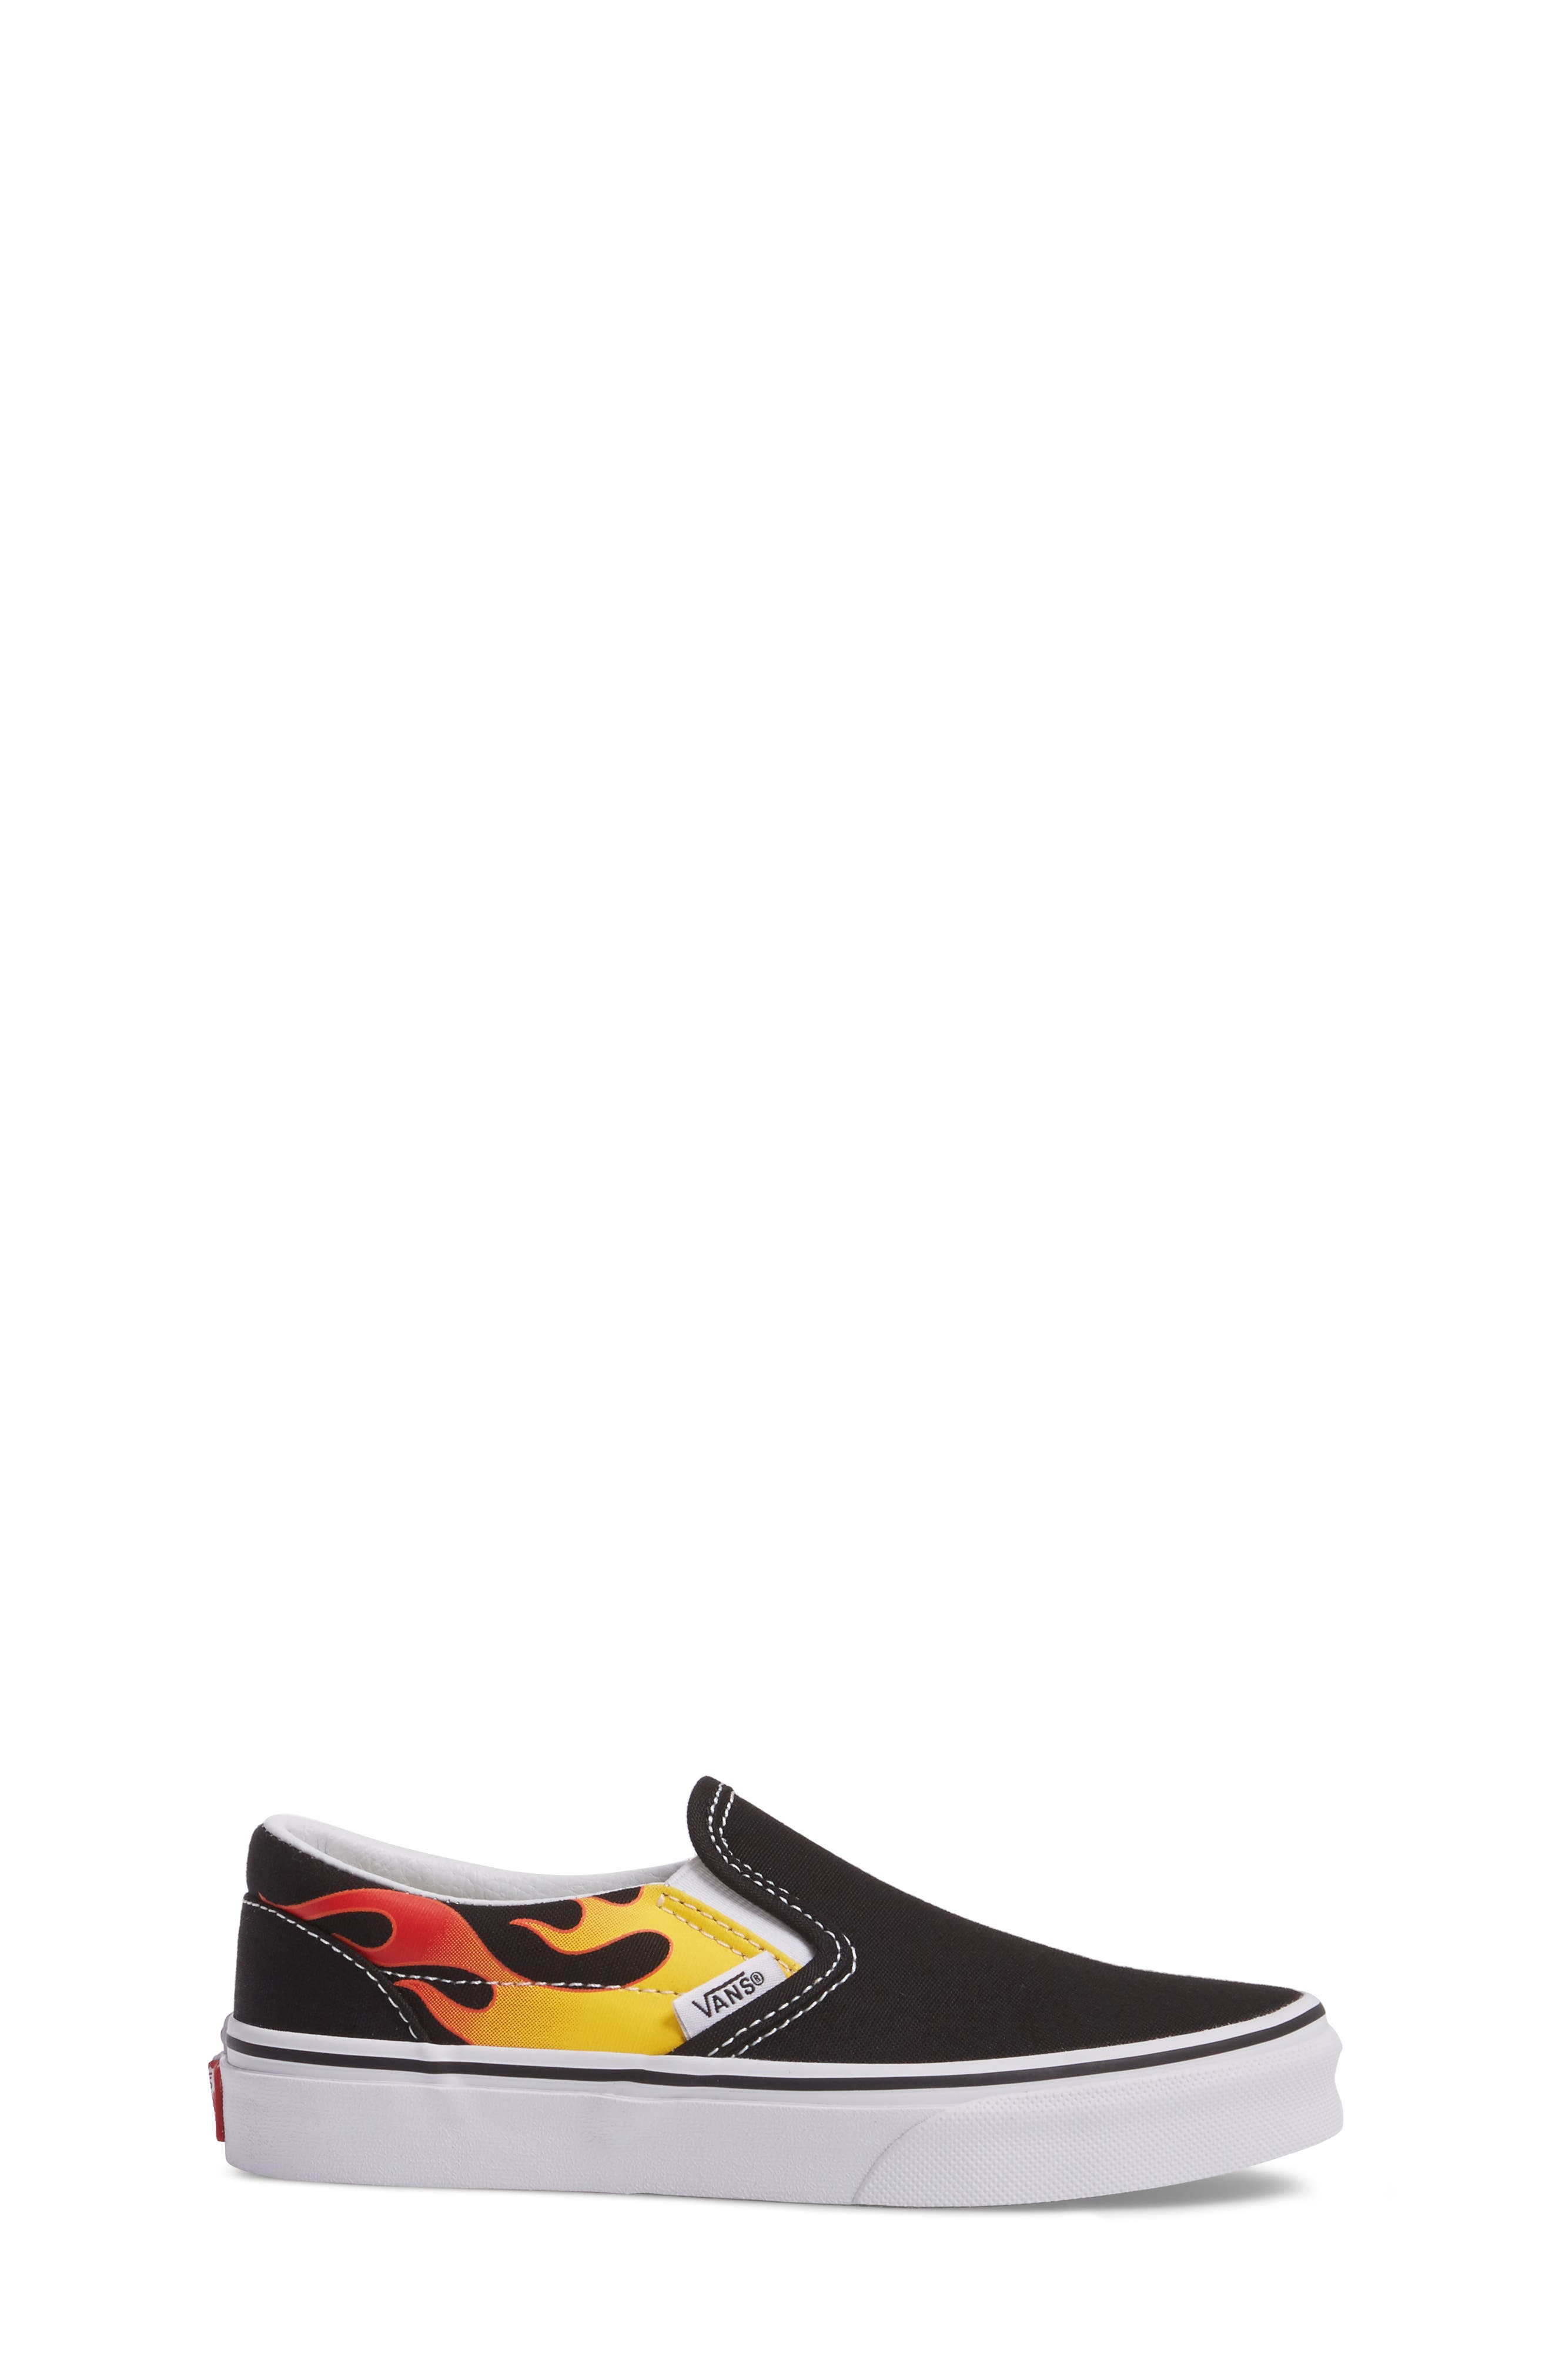 Alternate Image 3  - Vans Flame Classic Slip-On Sneaker (Toddler, Little Kid & Big Kid)